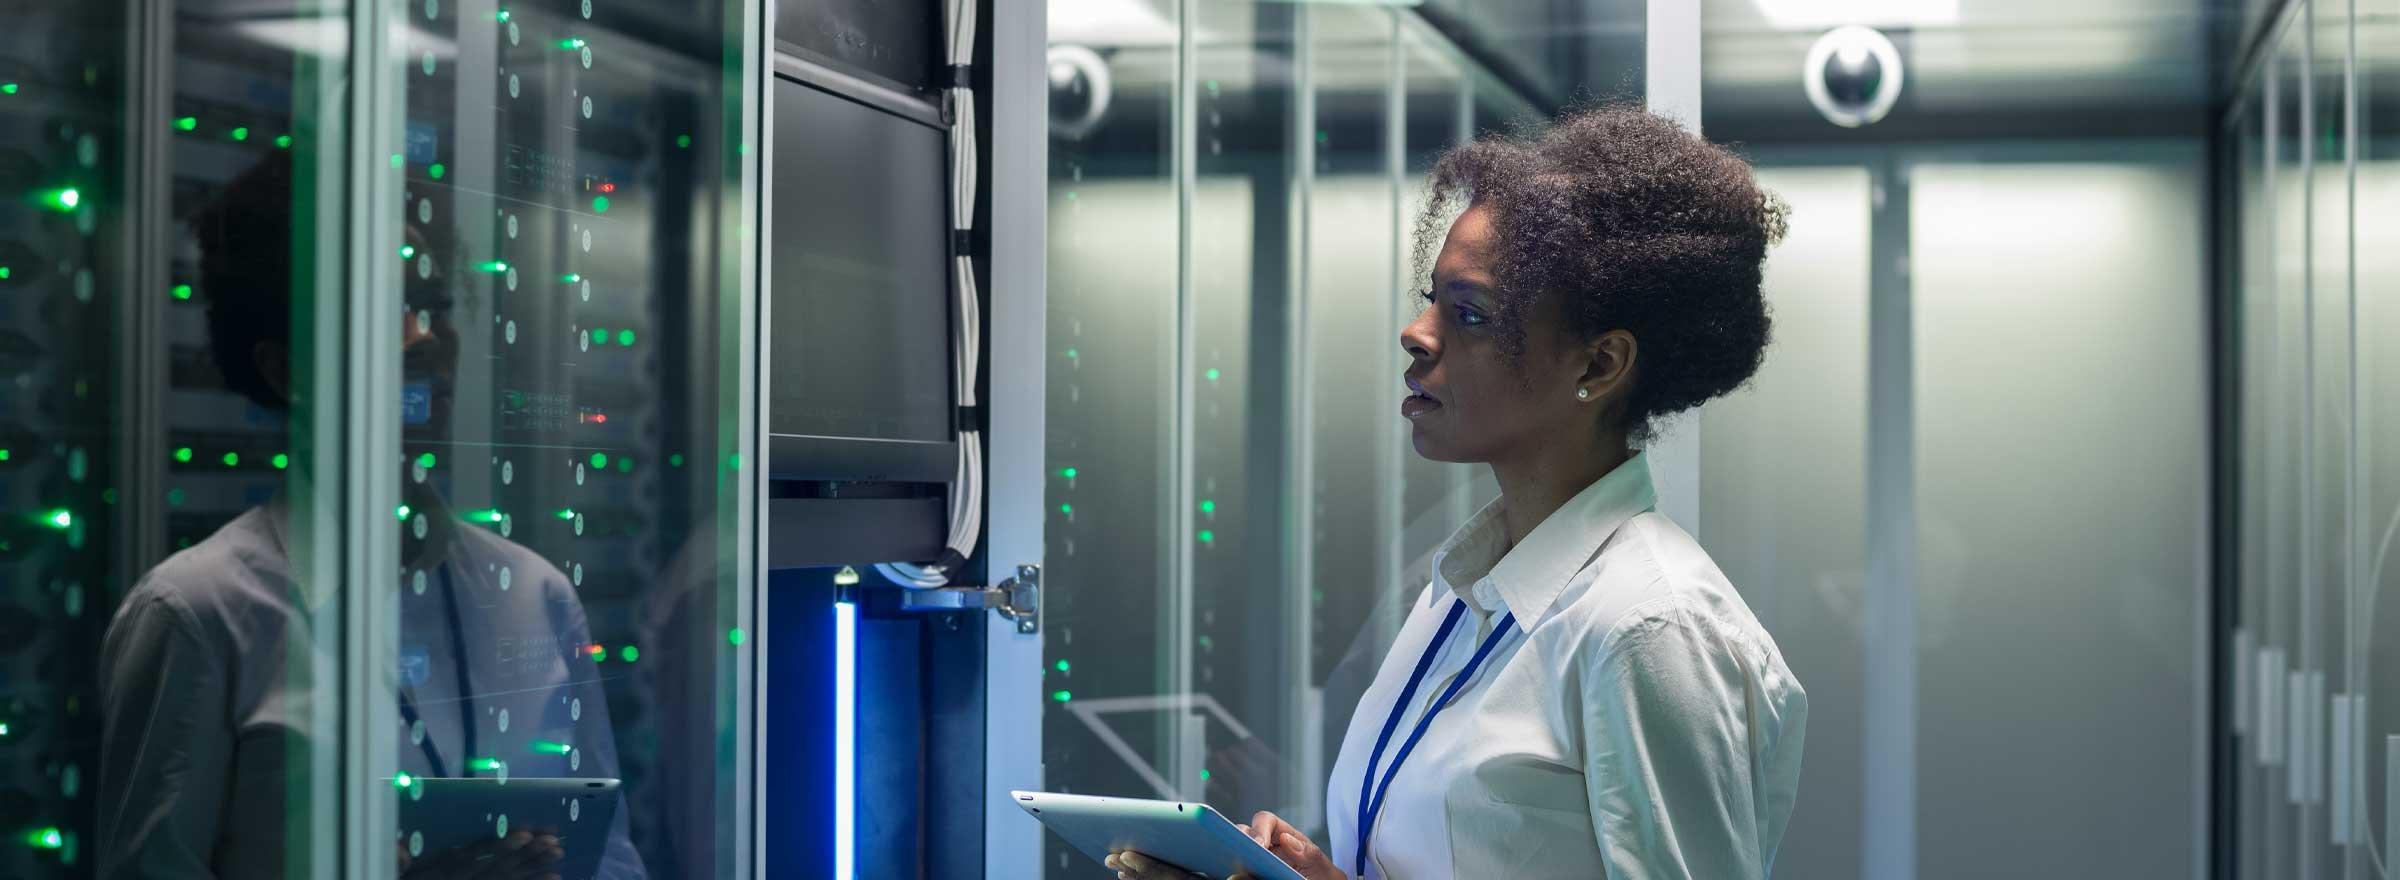 Technician inspecting a rack of servers